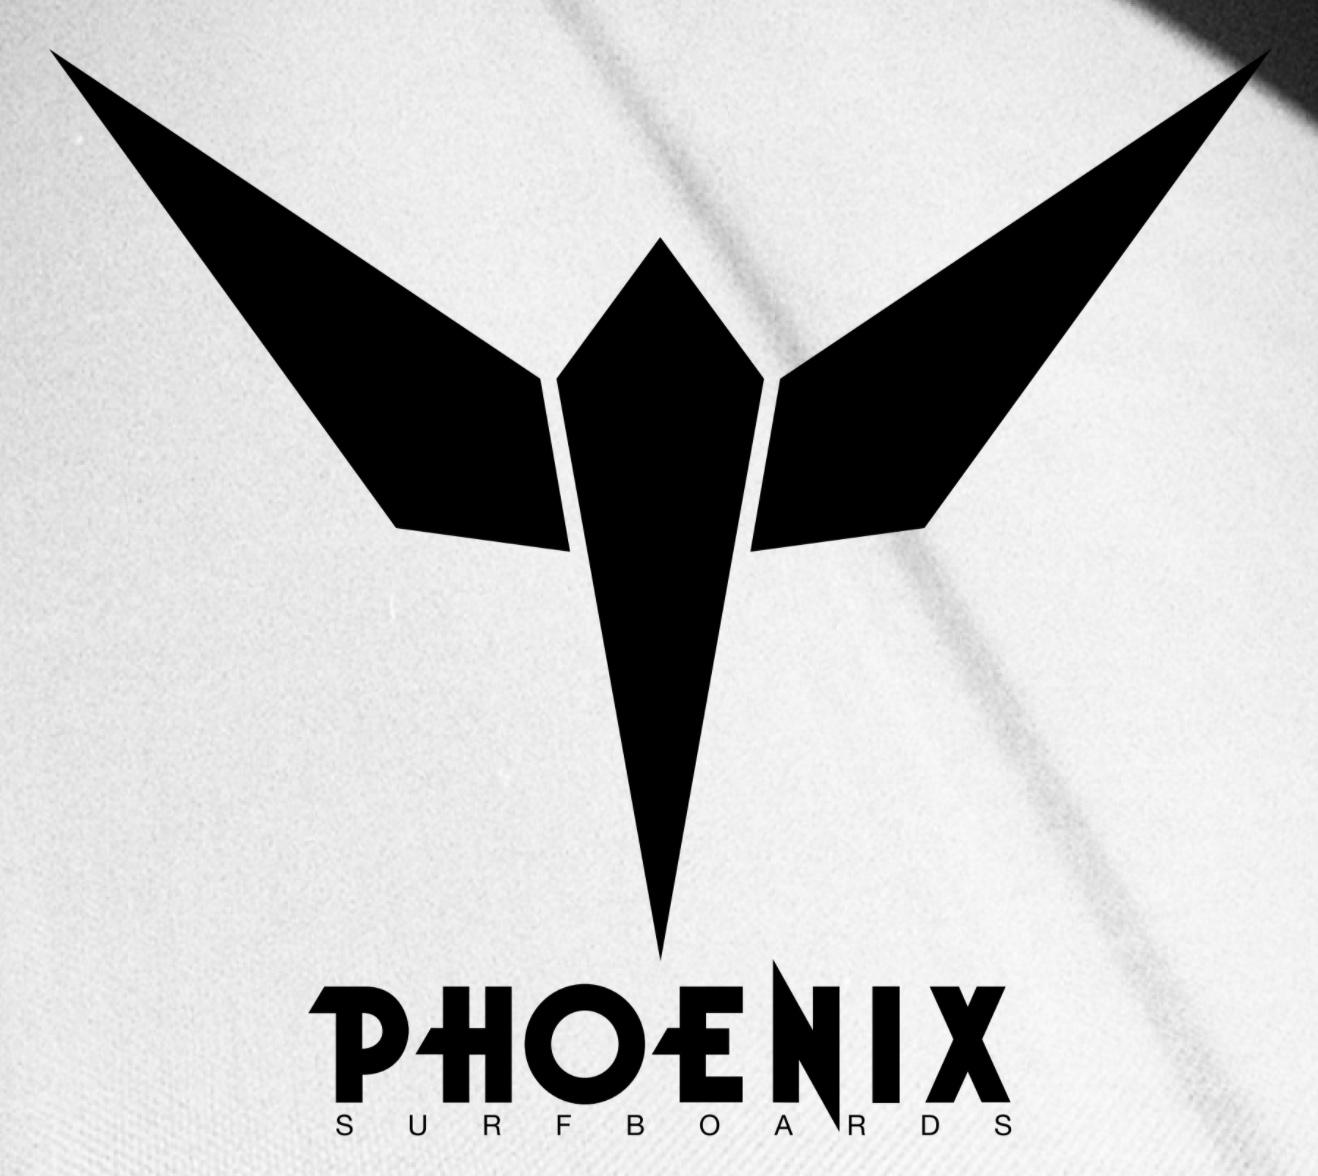 Phoenix surfboards